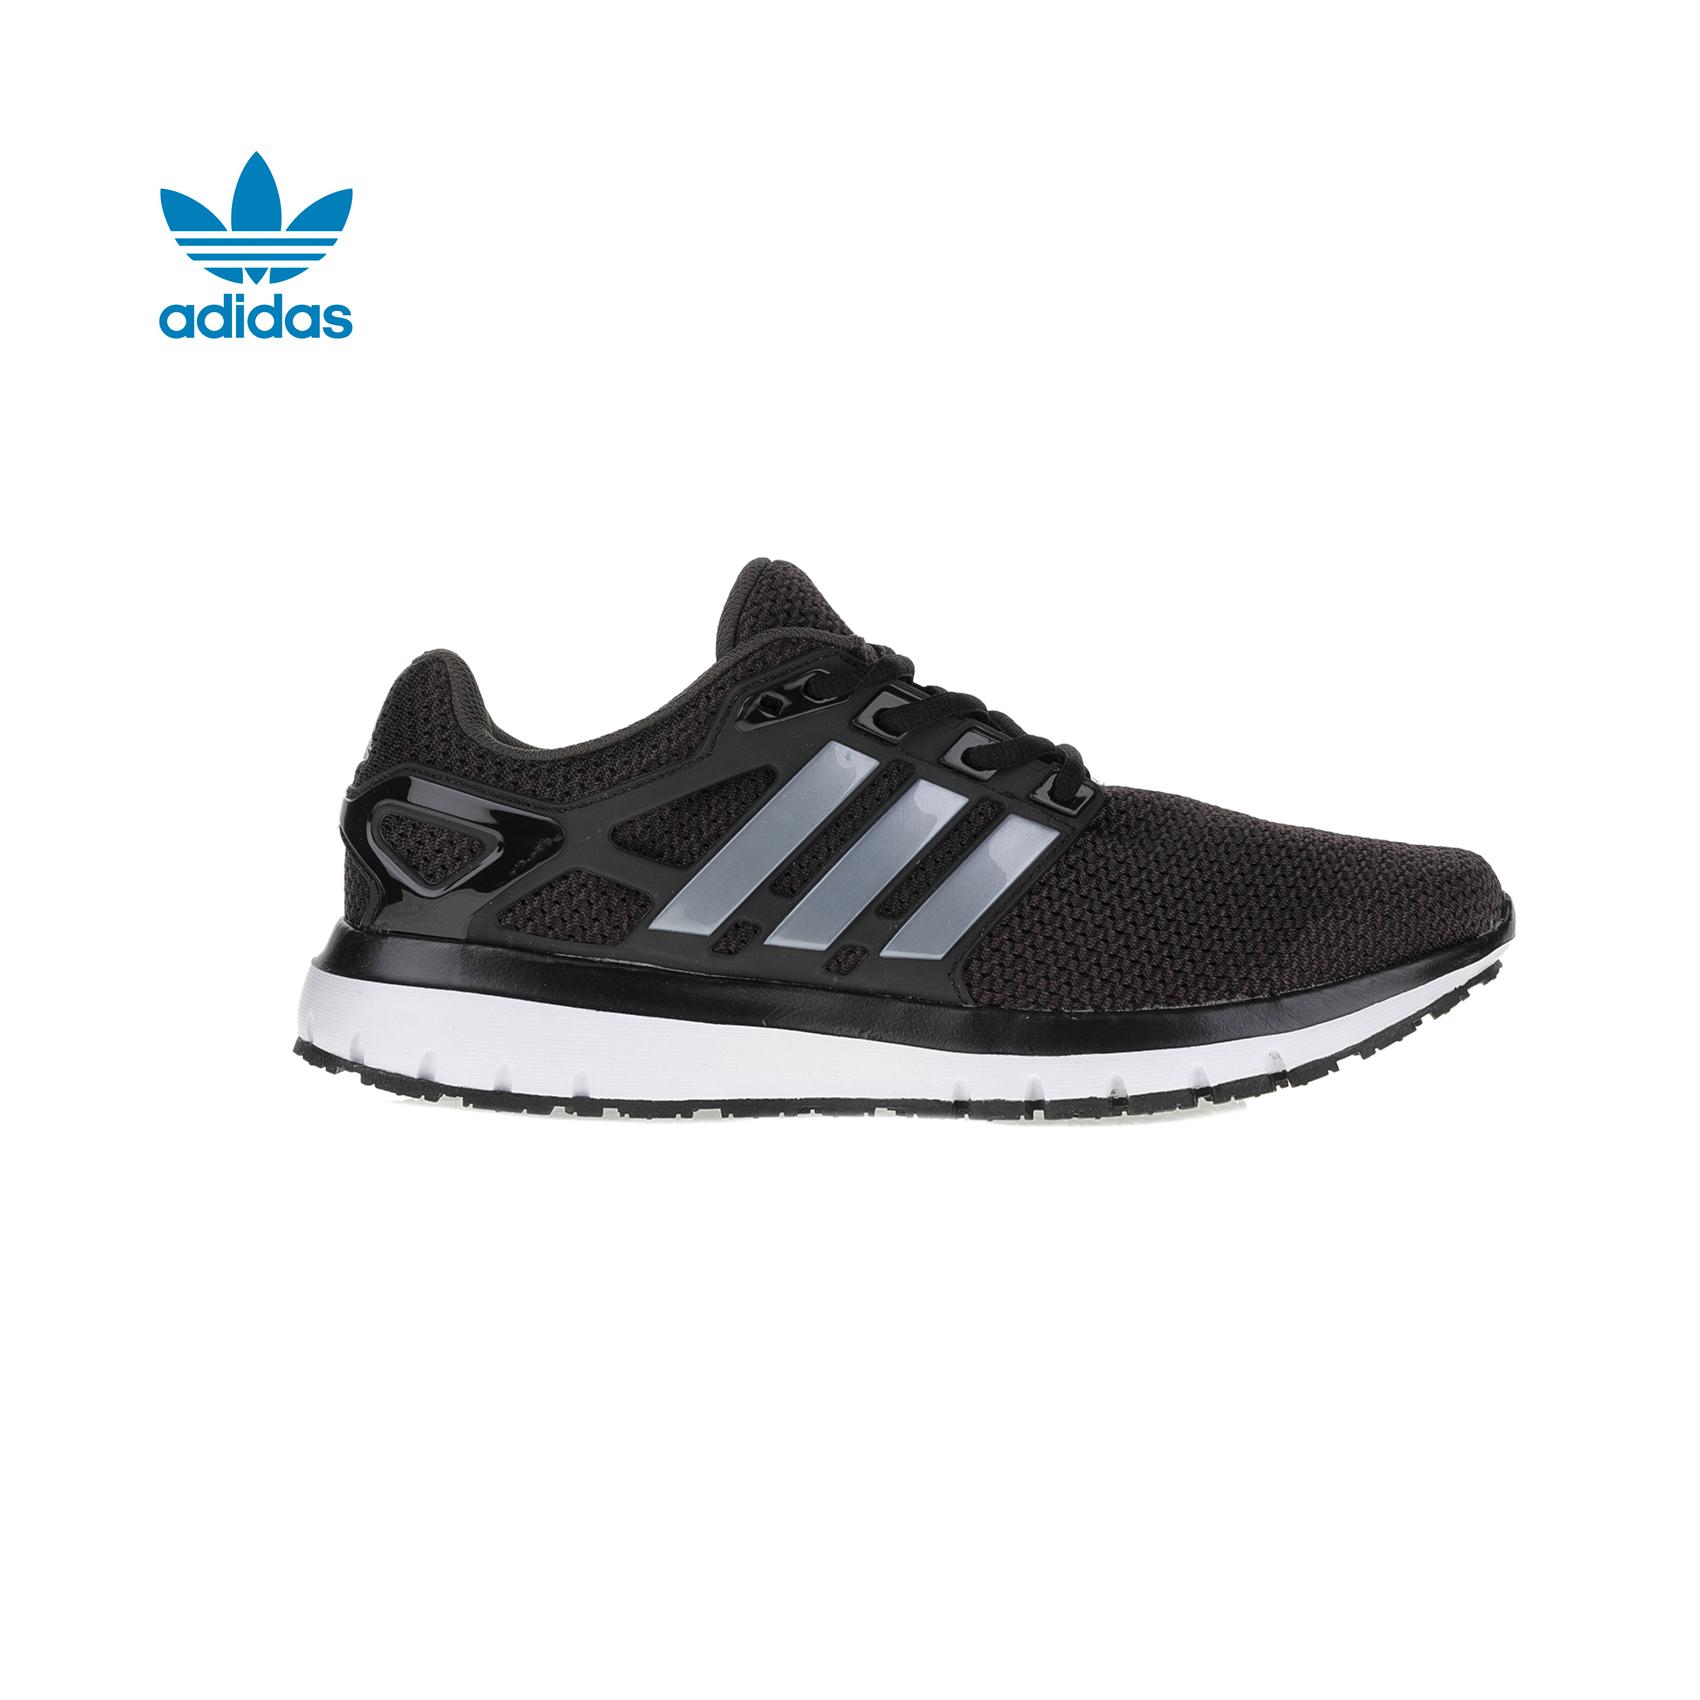 adidas Originals – Ανδρικά παπούτσια adidas energy cloud wtc μαύρα